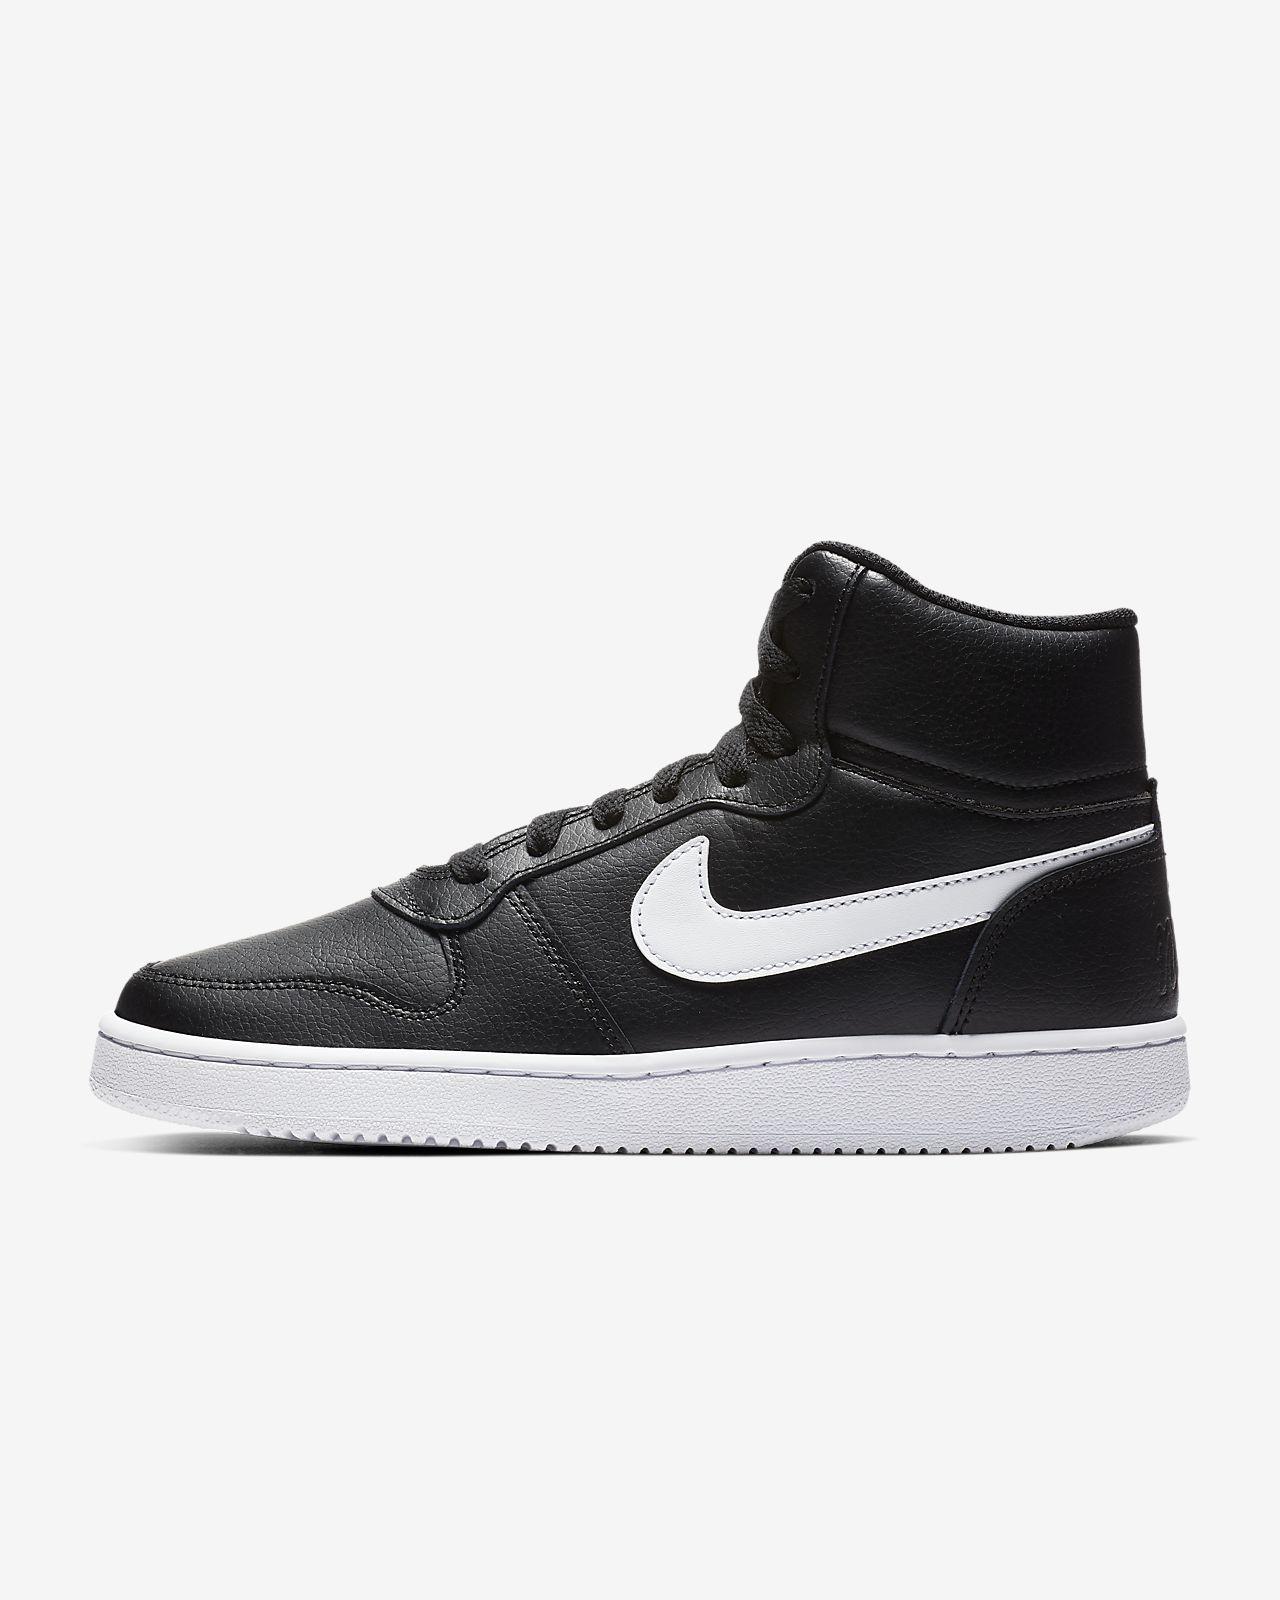 Nike Ebernon Mid Women's Shoe